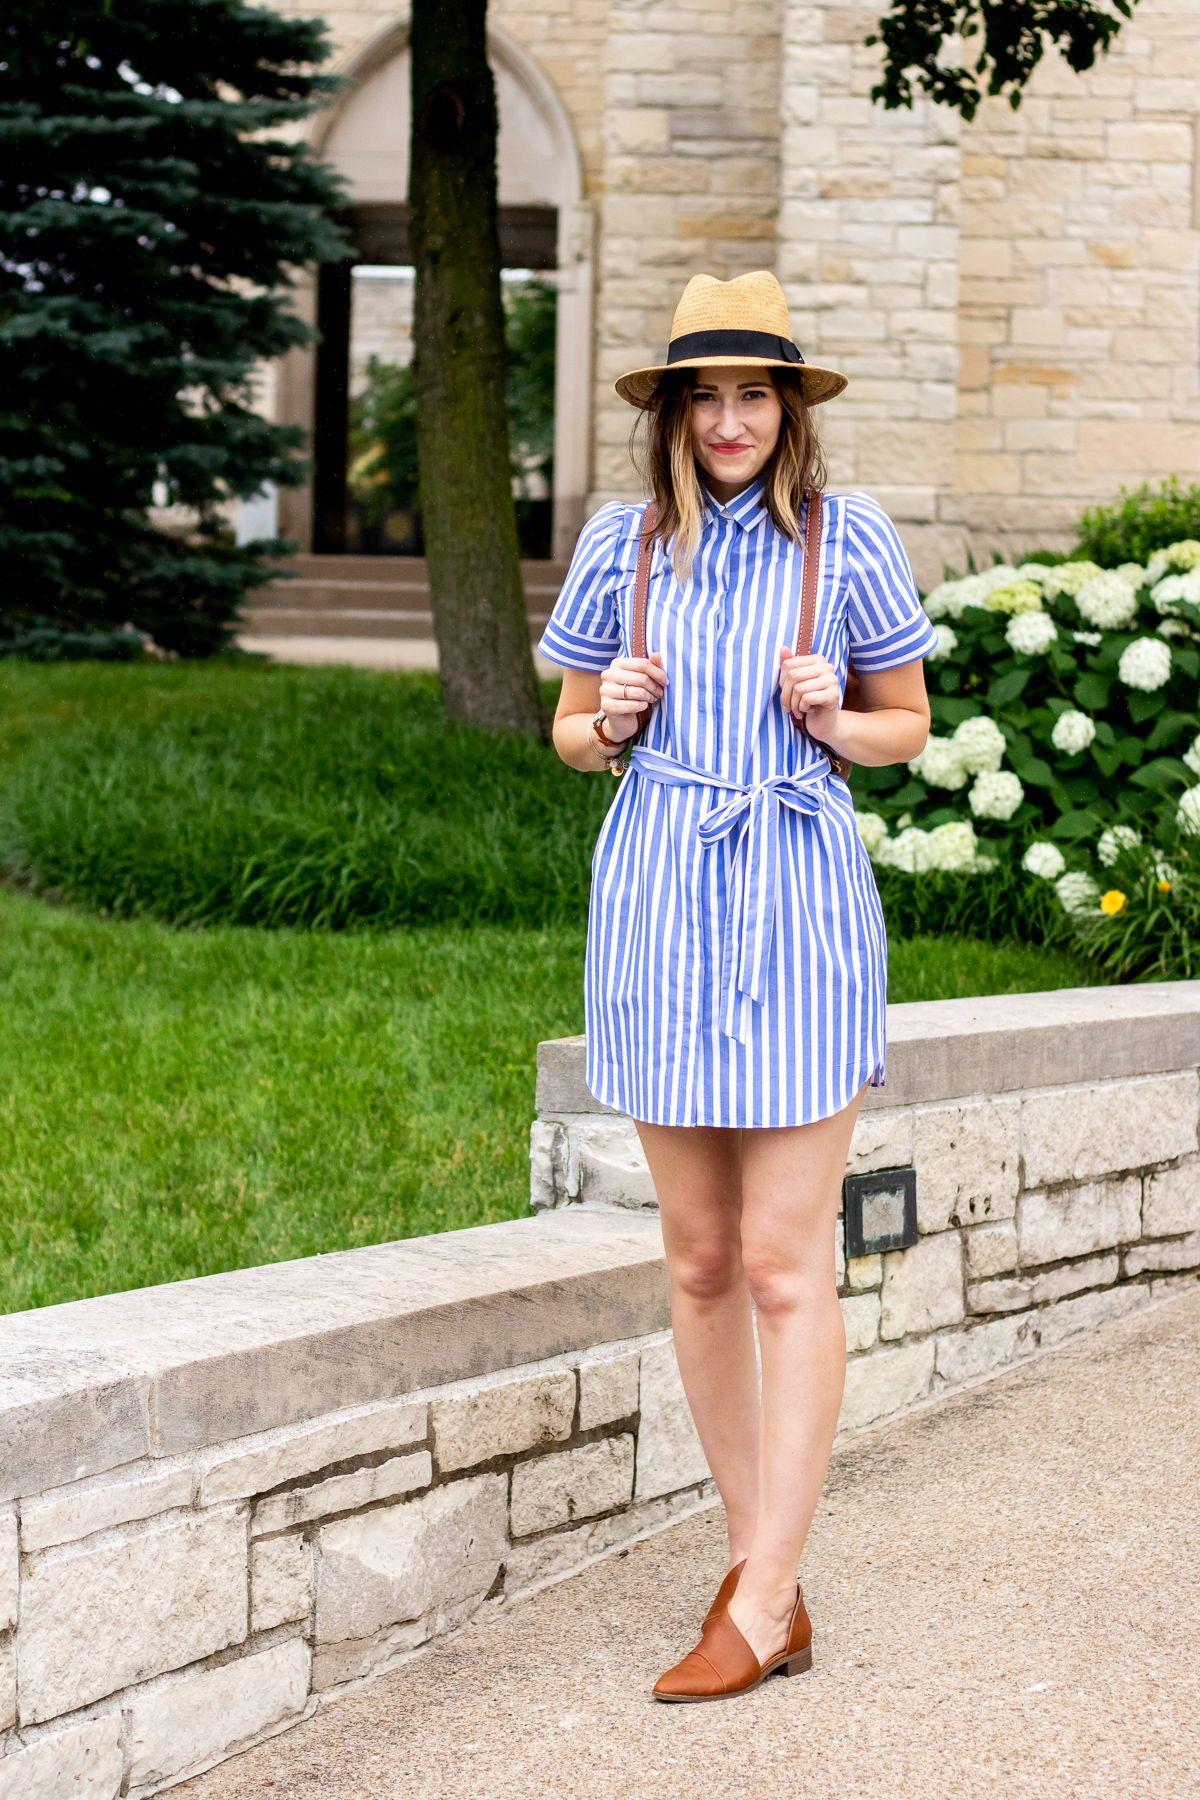 Current Crush Shirt Dresses Girl Meets Stripes Womens Winter Fashion Outfits Shirt Dress Classy Dress [ 1800 x 1200 Pixel ]